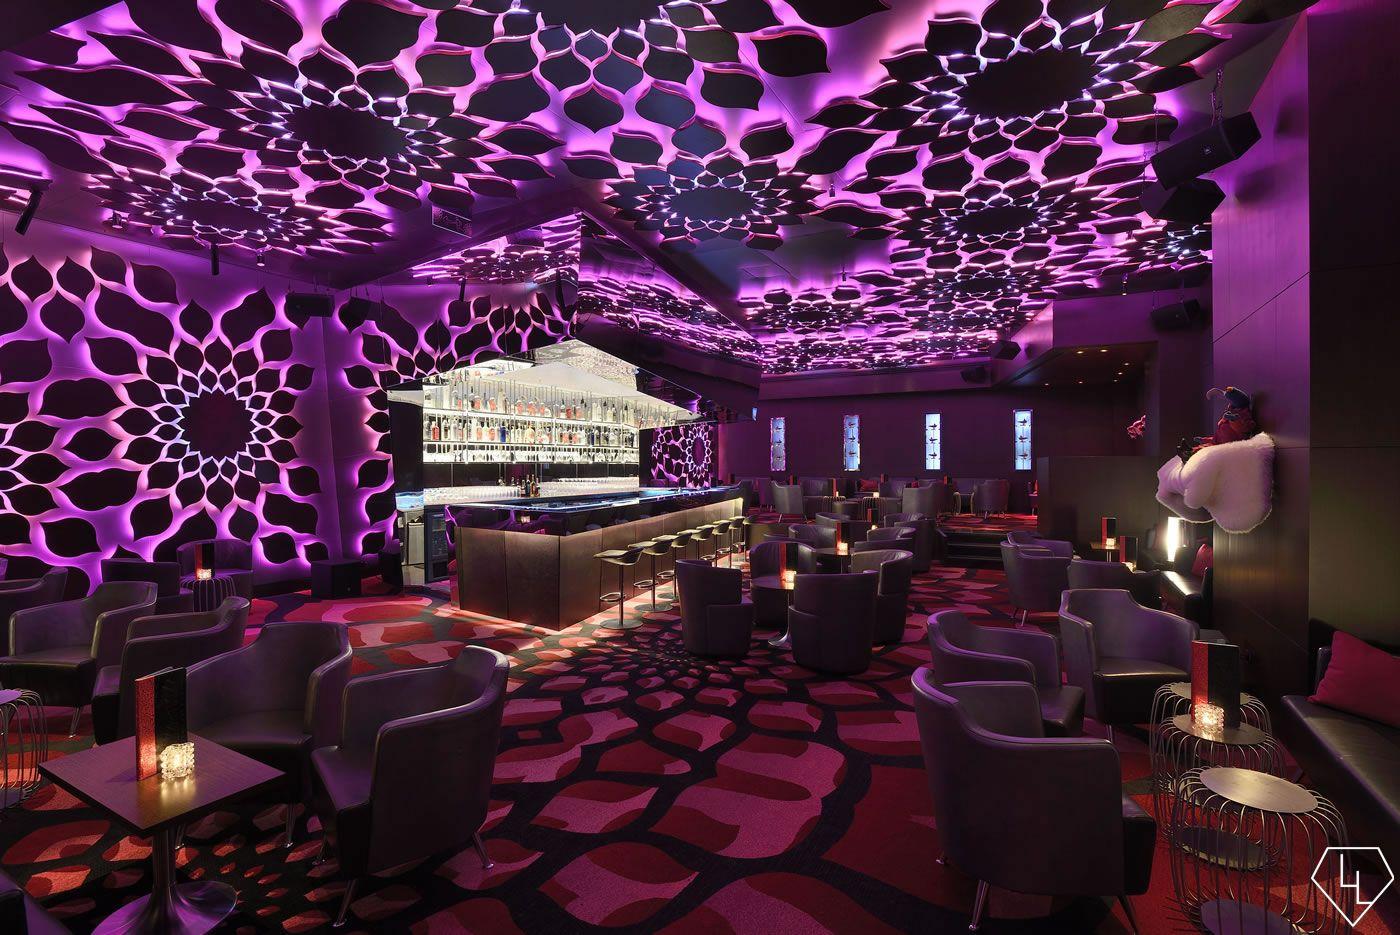 Design Notes A Look Inside The Trippy Razzmatazz Bar At The Jw Marriott Absheron Baku Azerbaijan Hookah Lounge Decor Bar Interior Design Nightclub Design